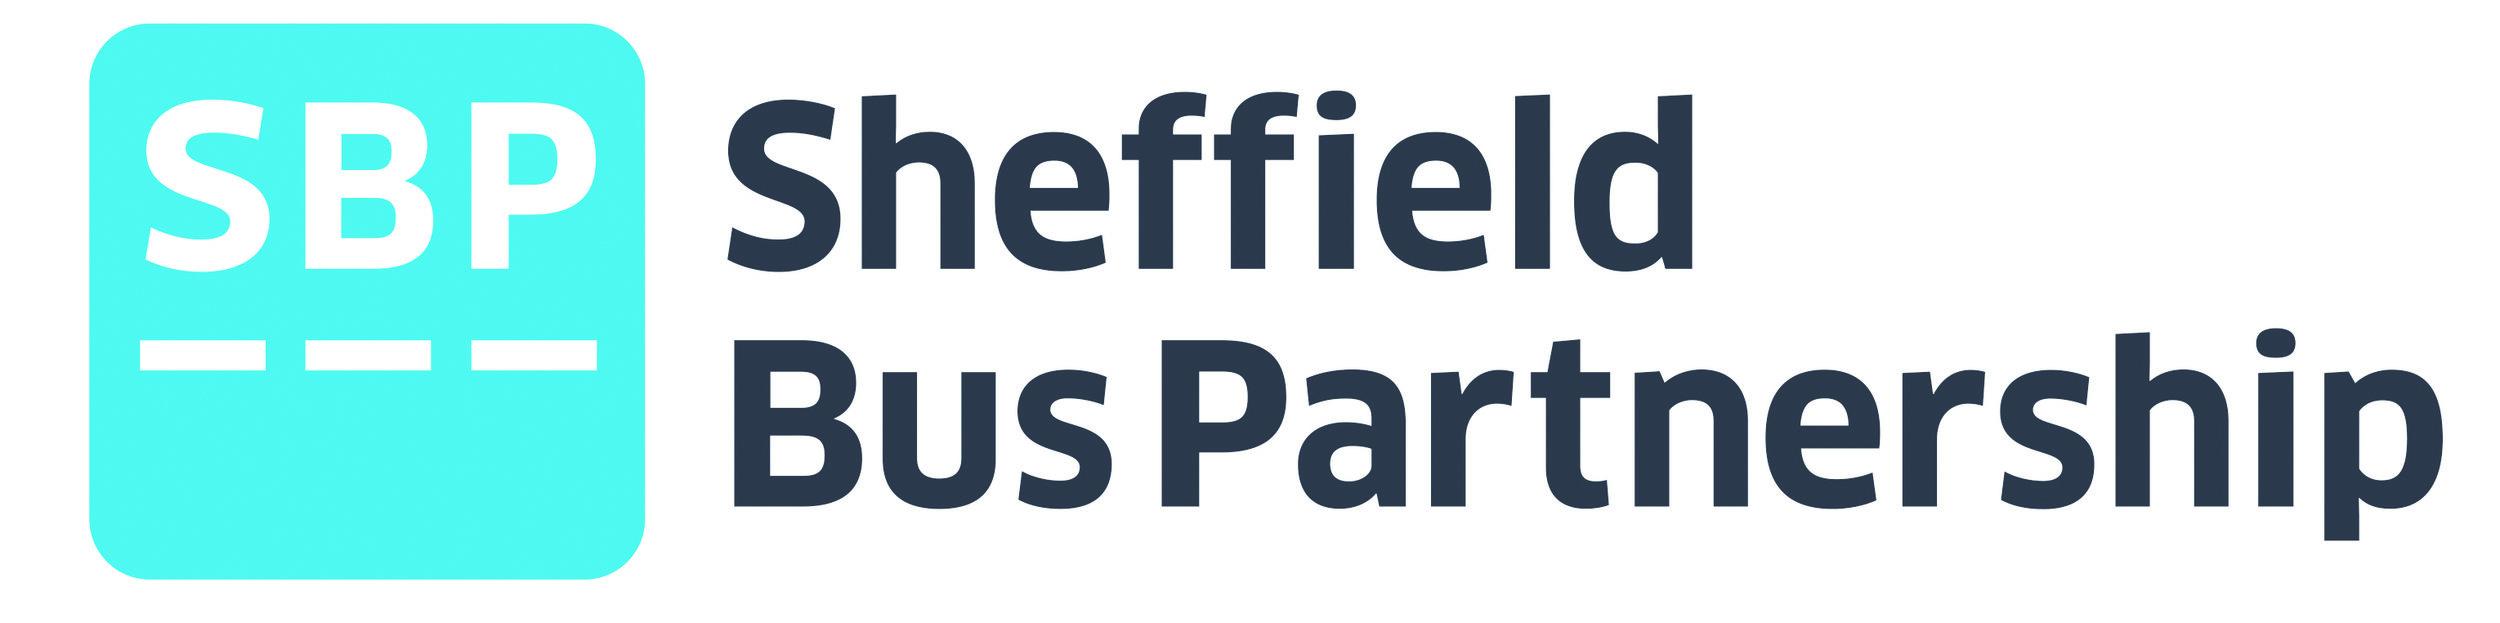 New Sheffield Bus Partnership logo(1).jpg